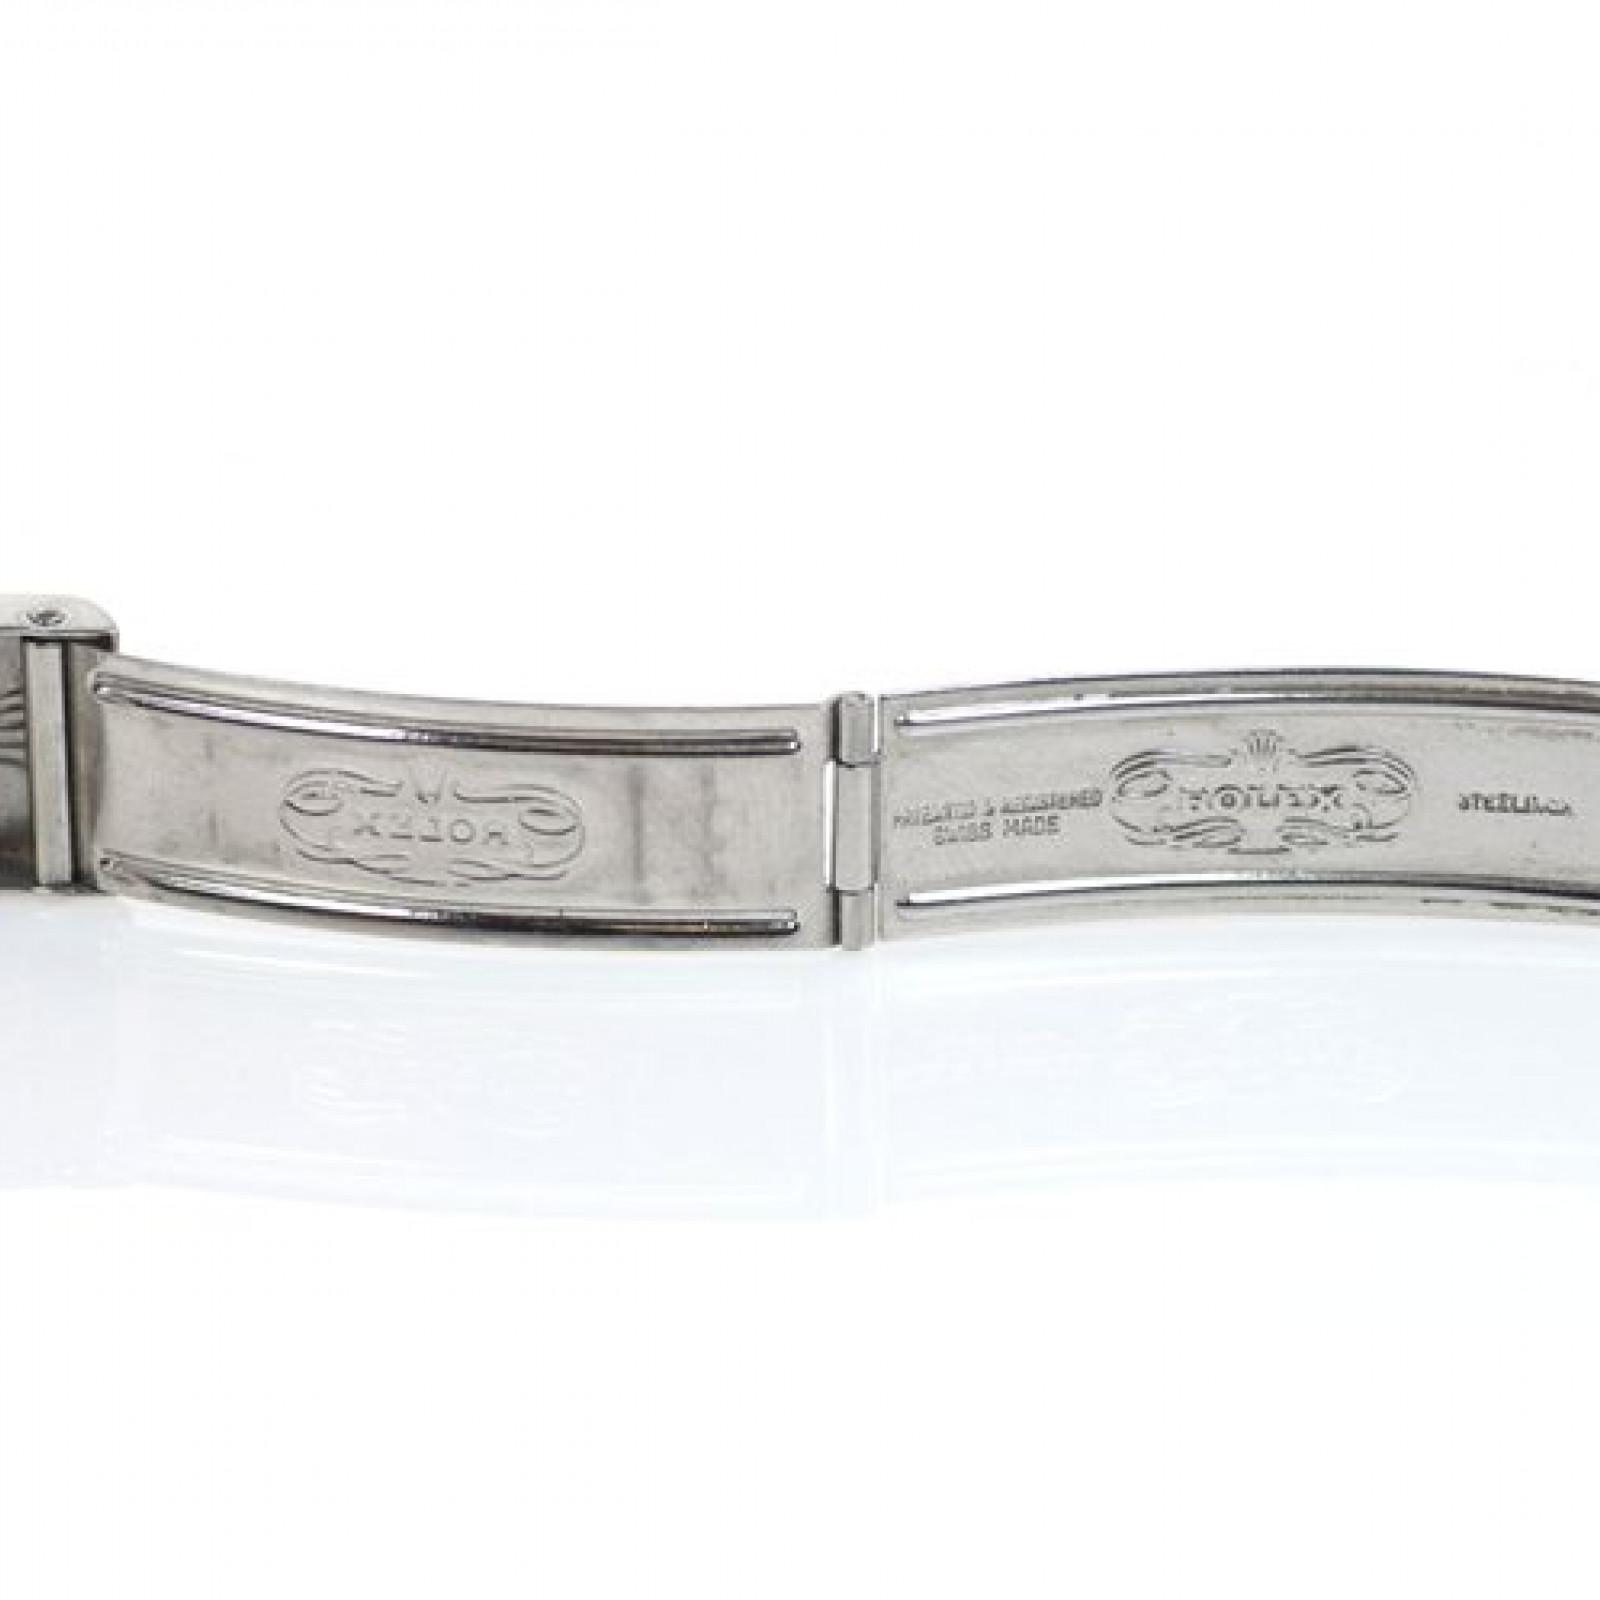 Vintage Rolex Daytona Cosmograph Paul Newman 6241 Steel